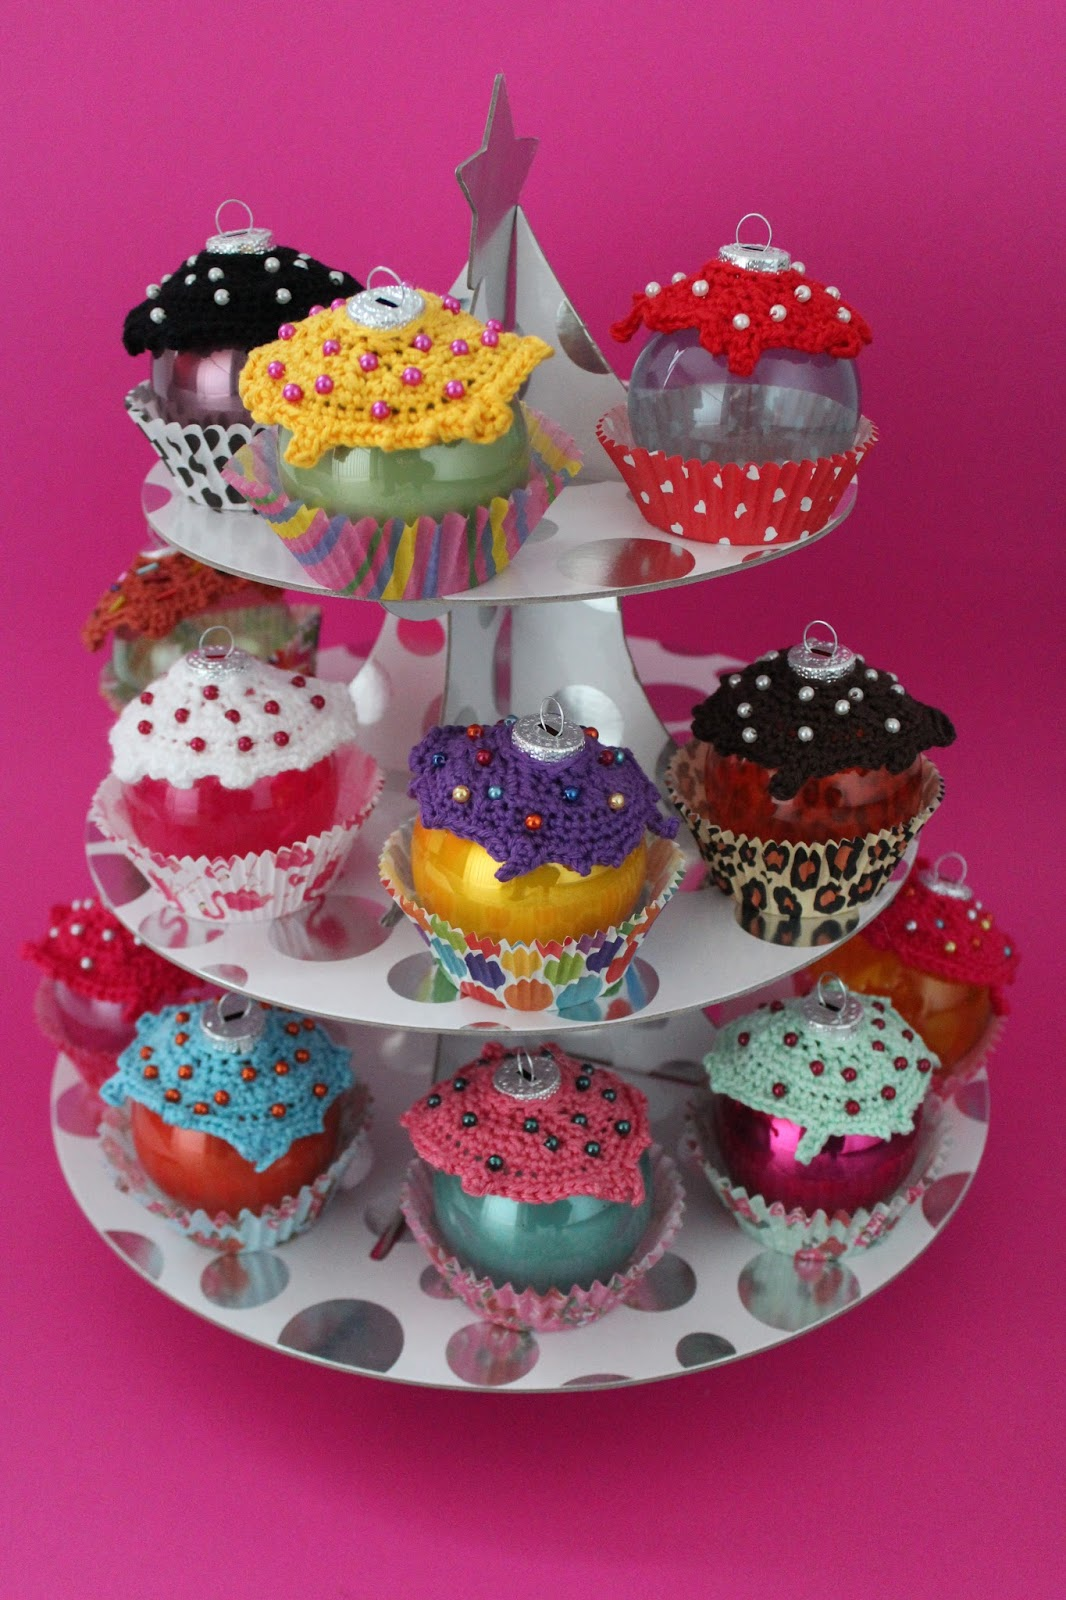 diy cupcakes weihnachtsschmuck ars vera e diy blog. Black Bedroom Furniture Sets. Home Design Ideas